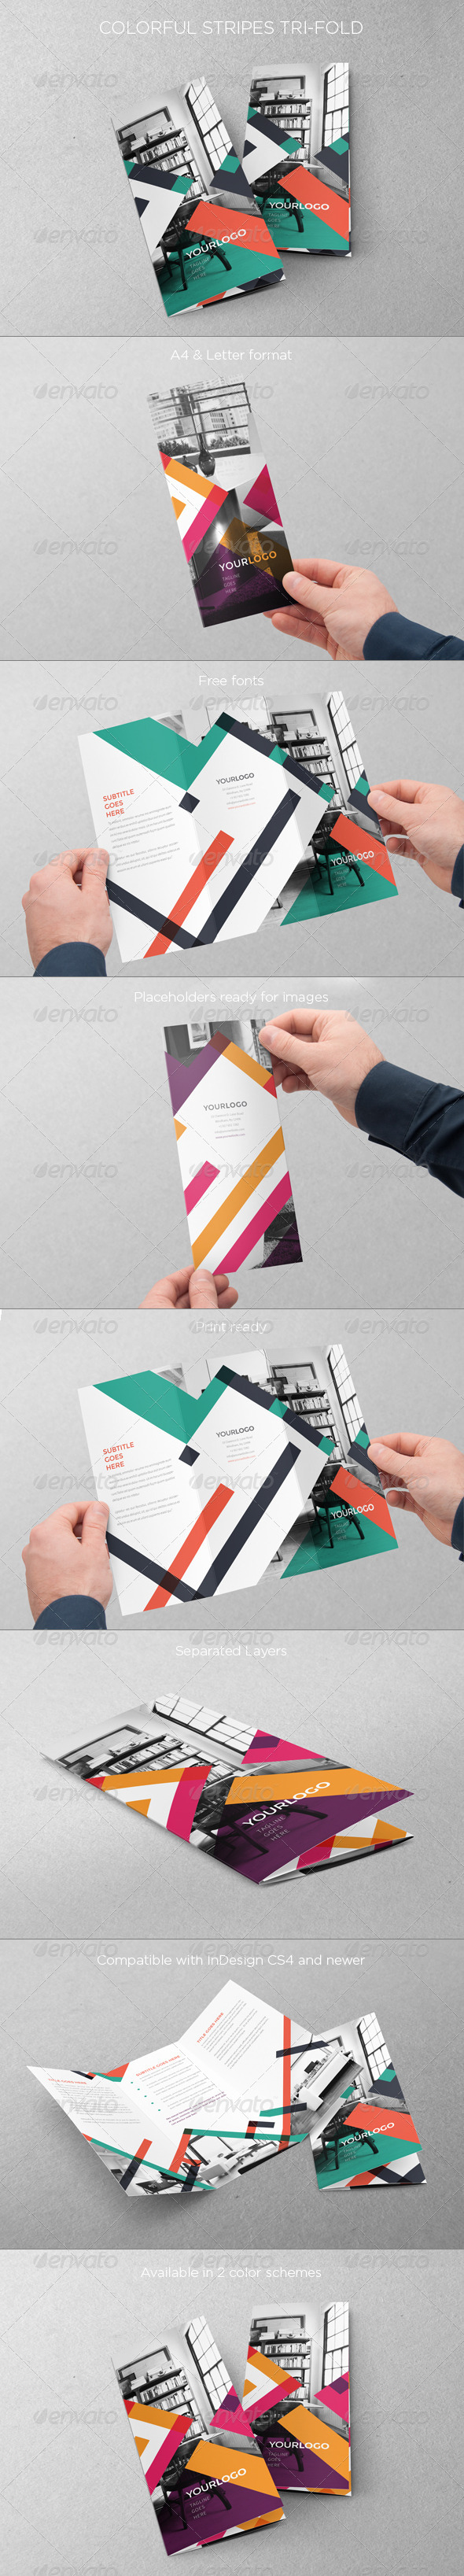 GraphicRiver Colorful Stripes Trifold 8041095